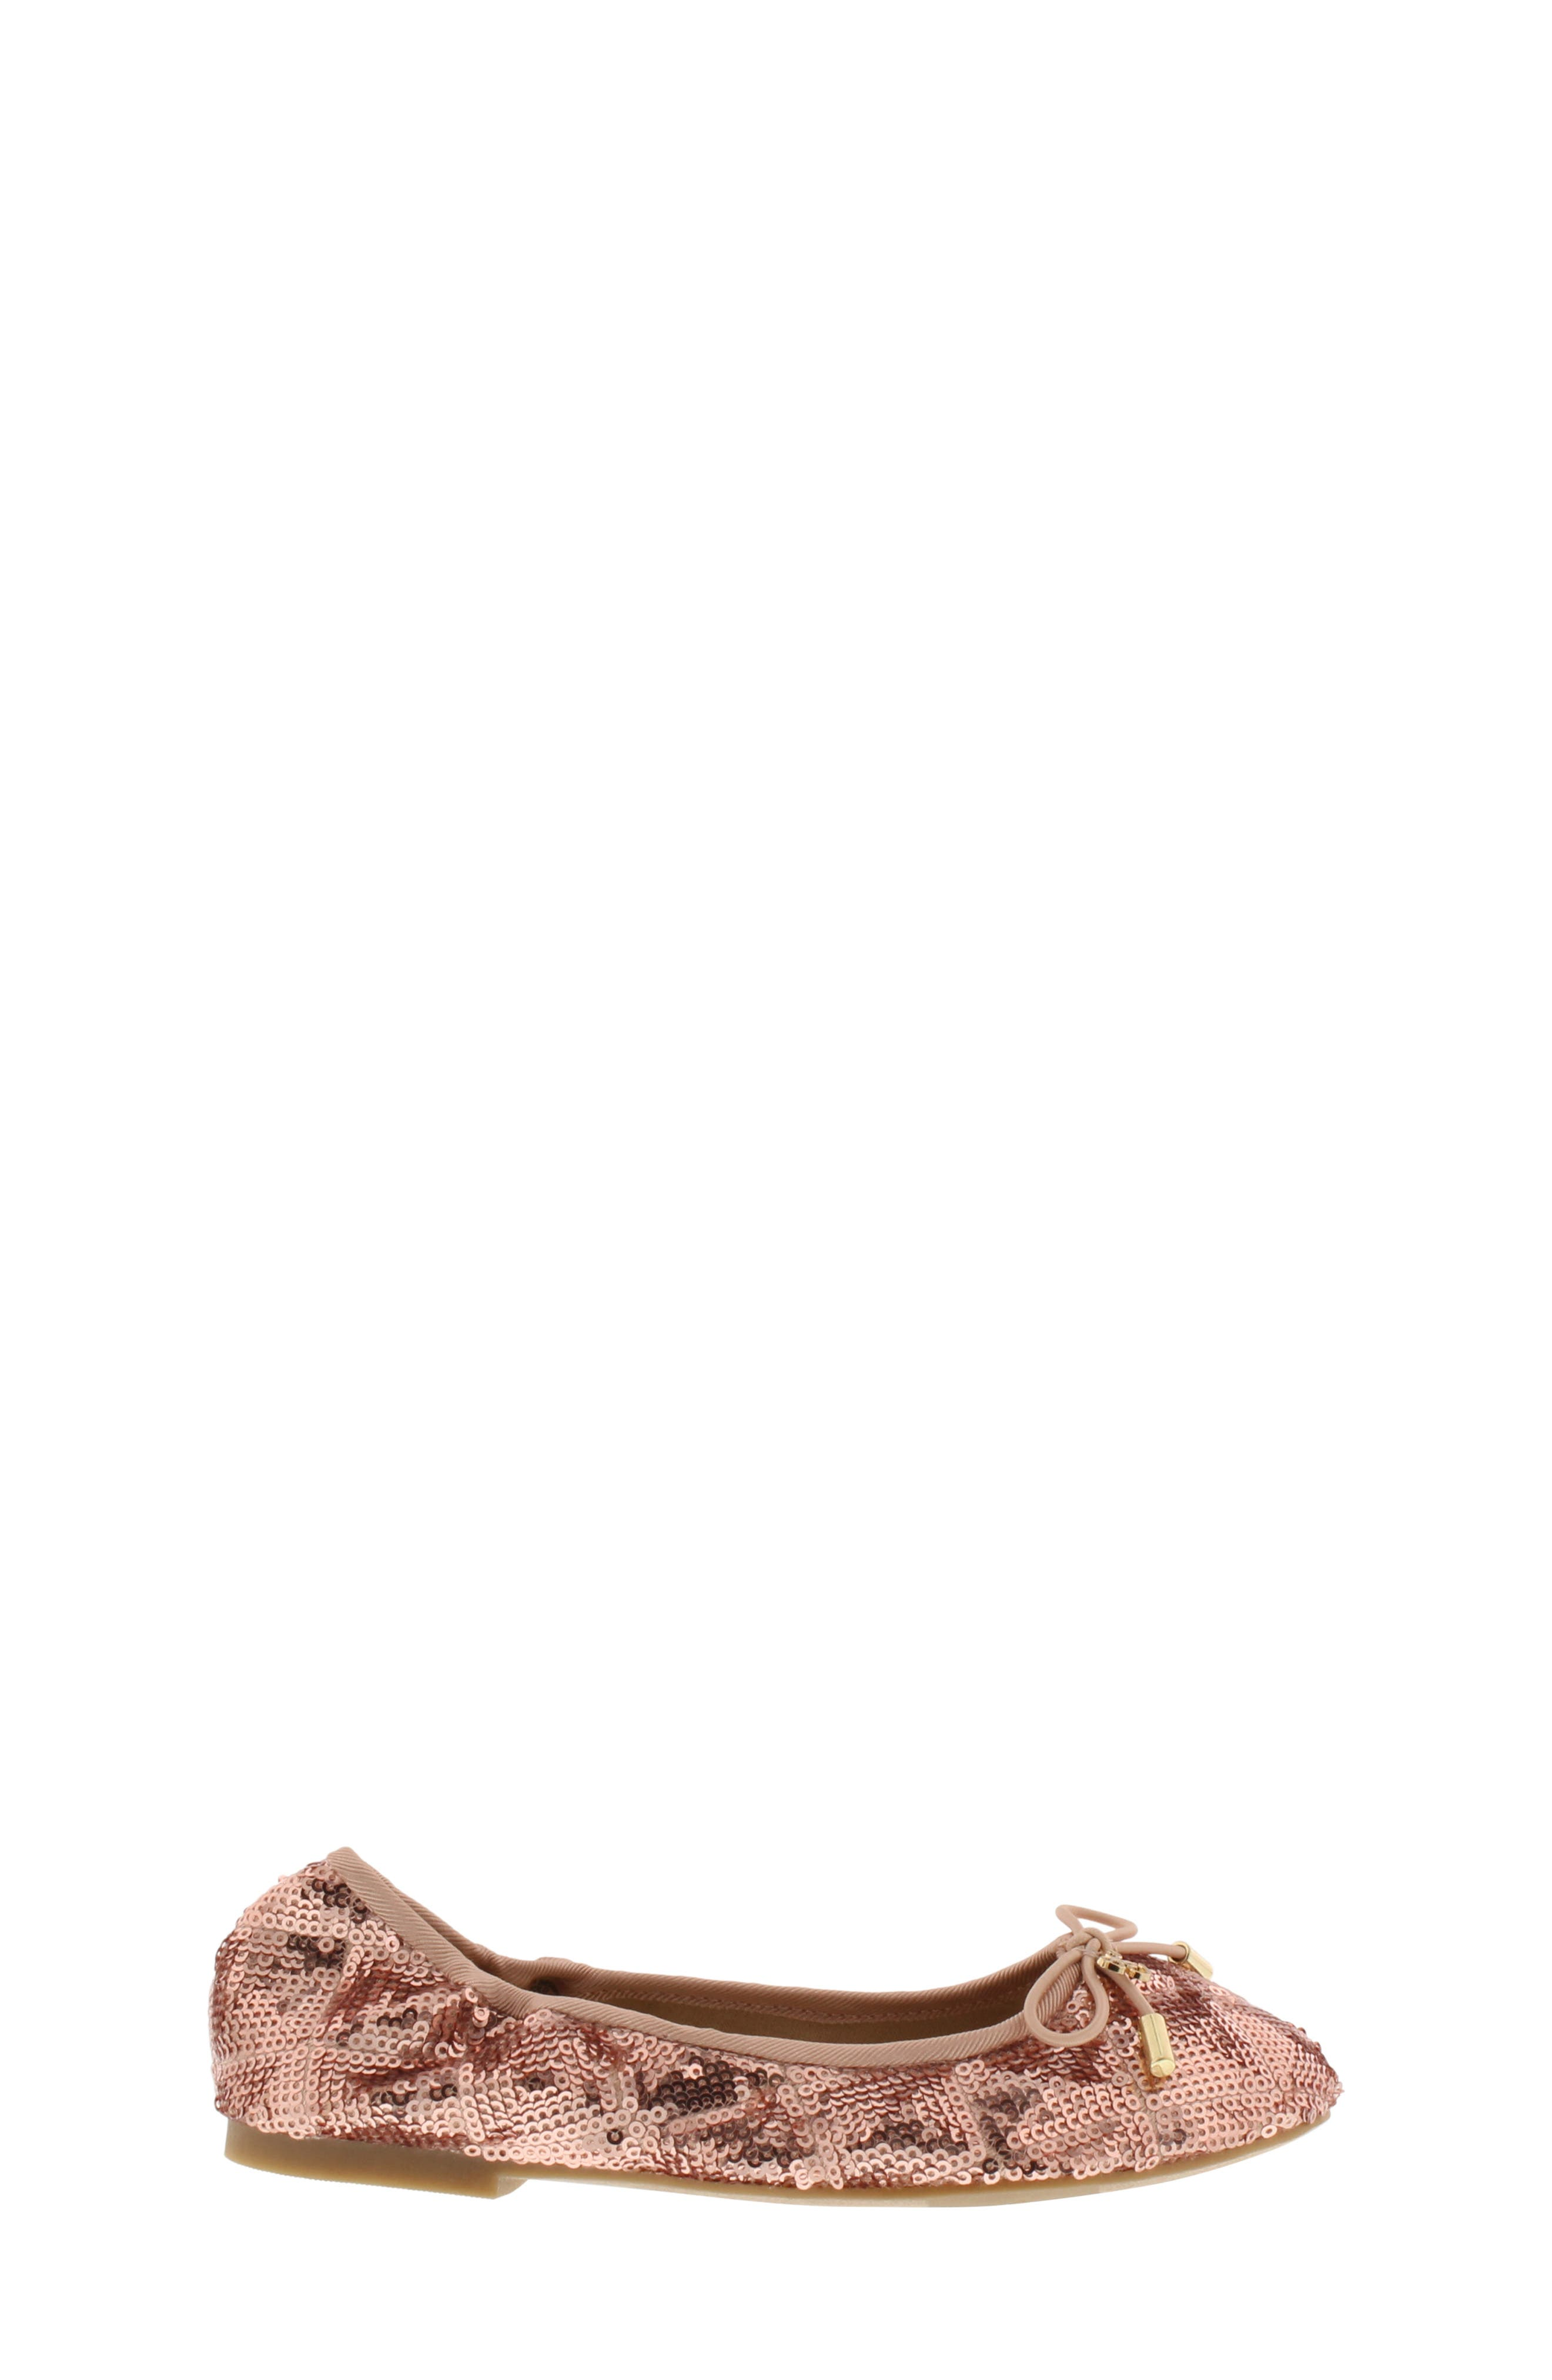 SAM EDELMAN, Felicia Sequin Ballet Flat, Alternate thumbnail 3, color, ROSE GOLD